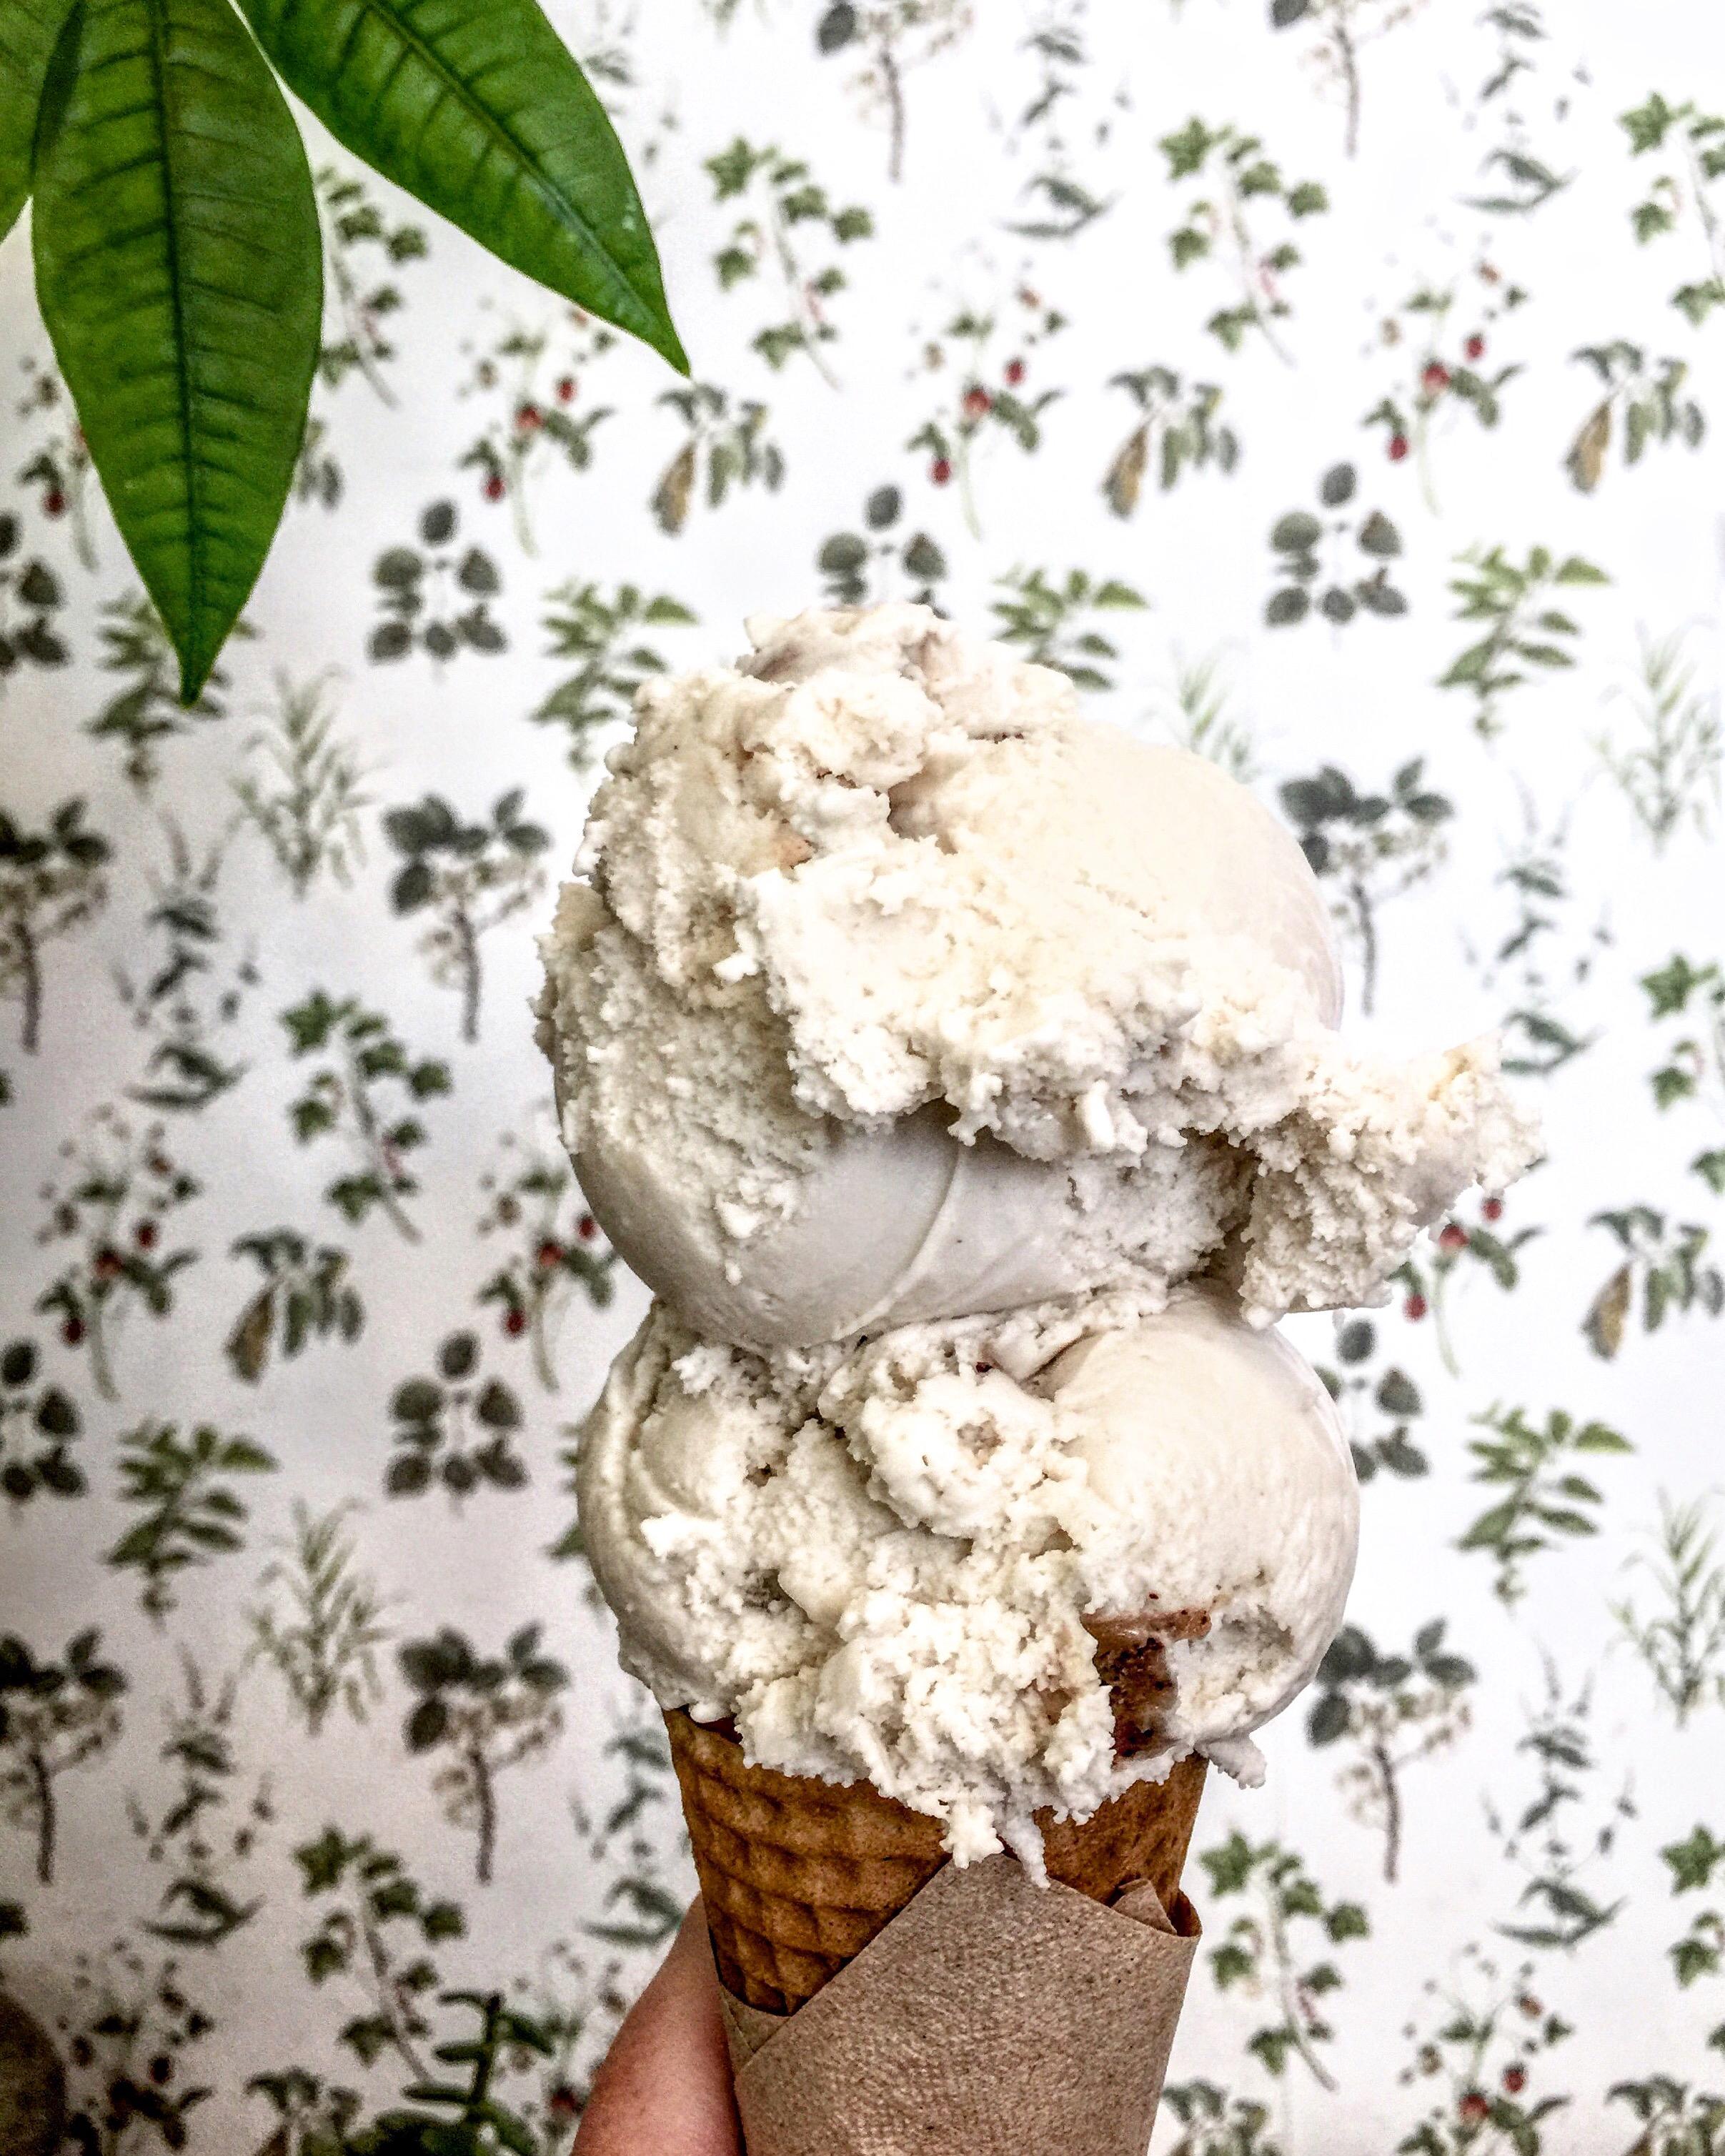 Summer cool down at  Van Leeuwen  - they have the best vegan ice cream